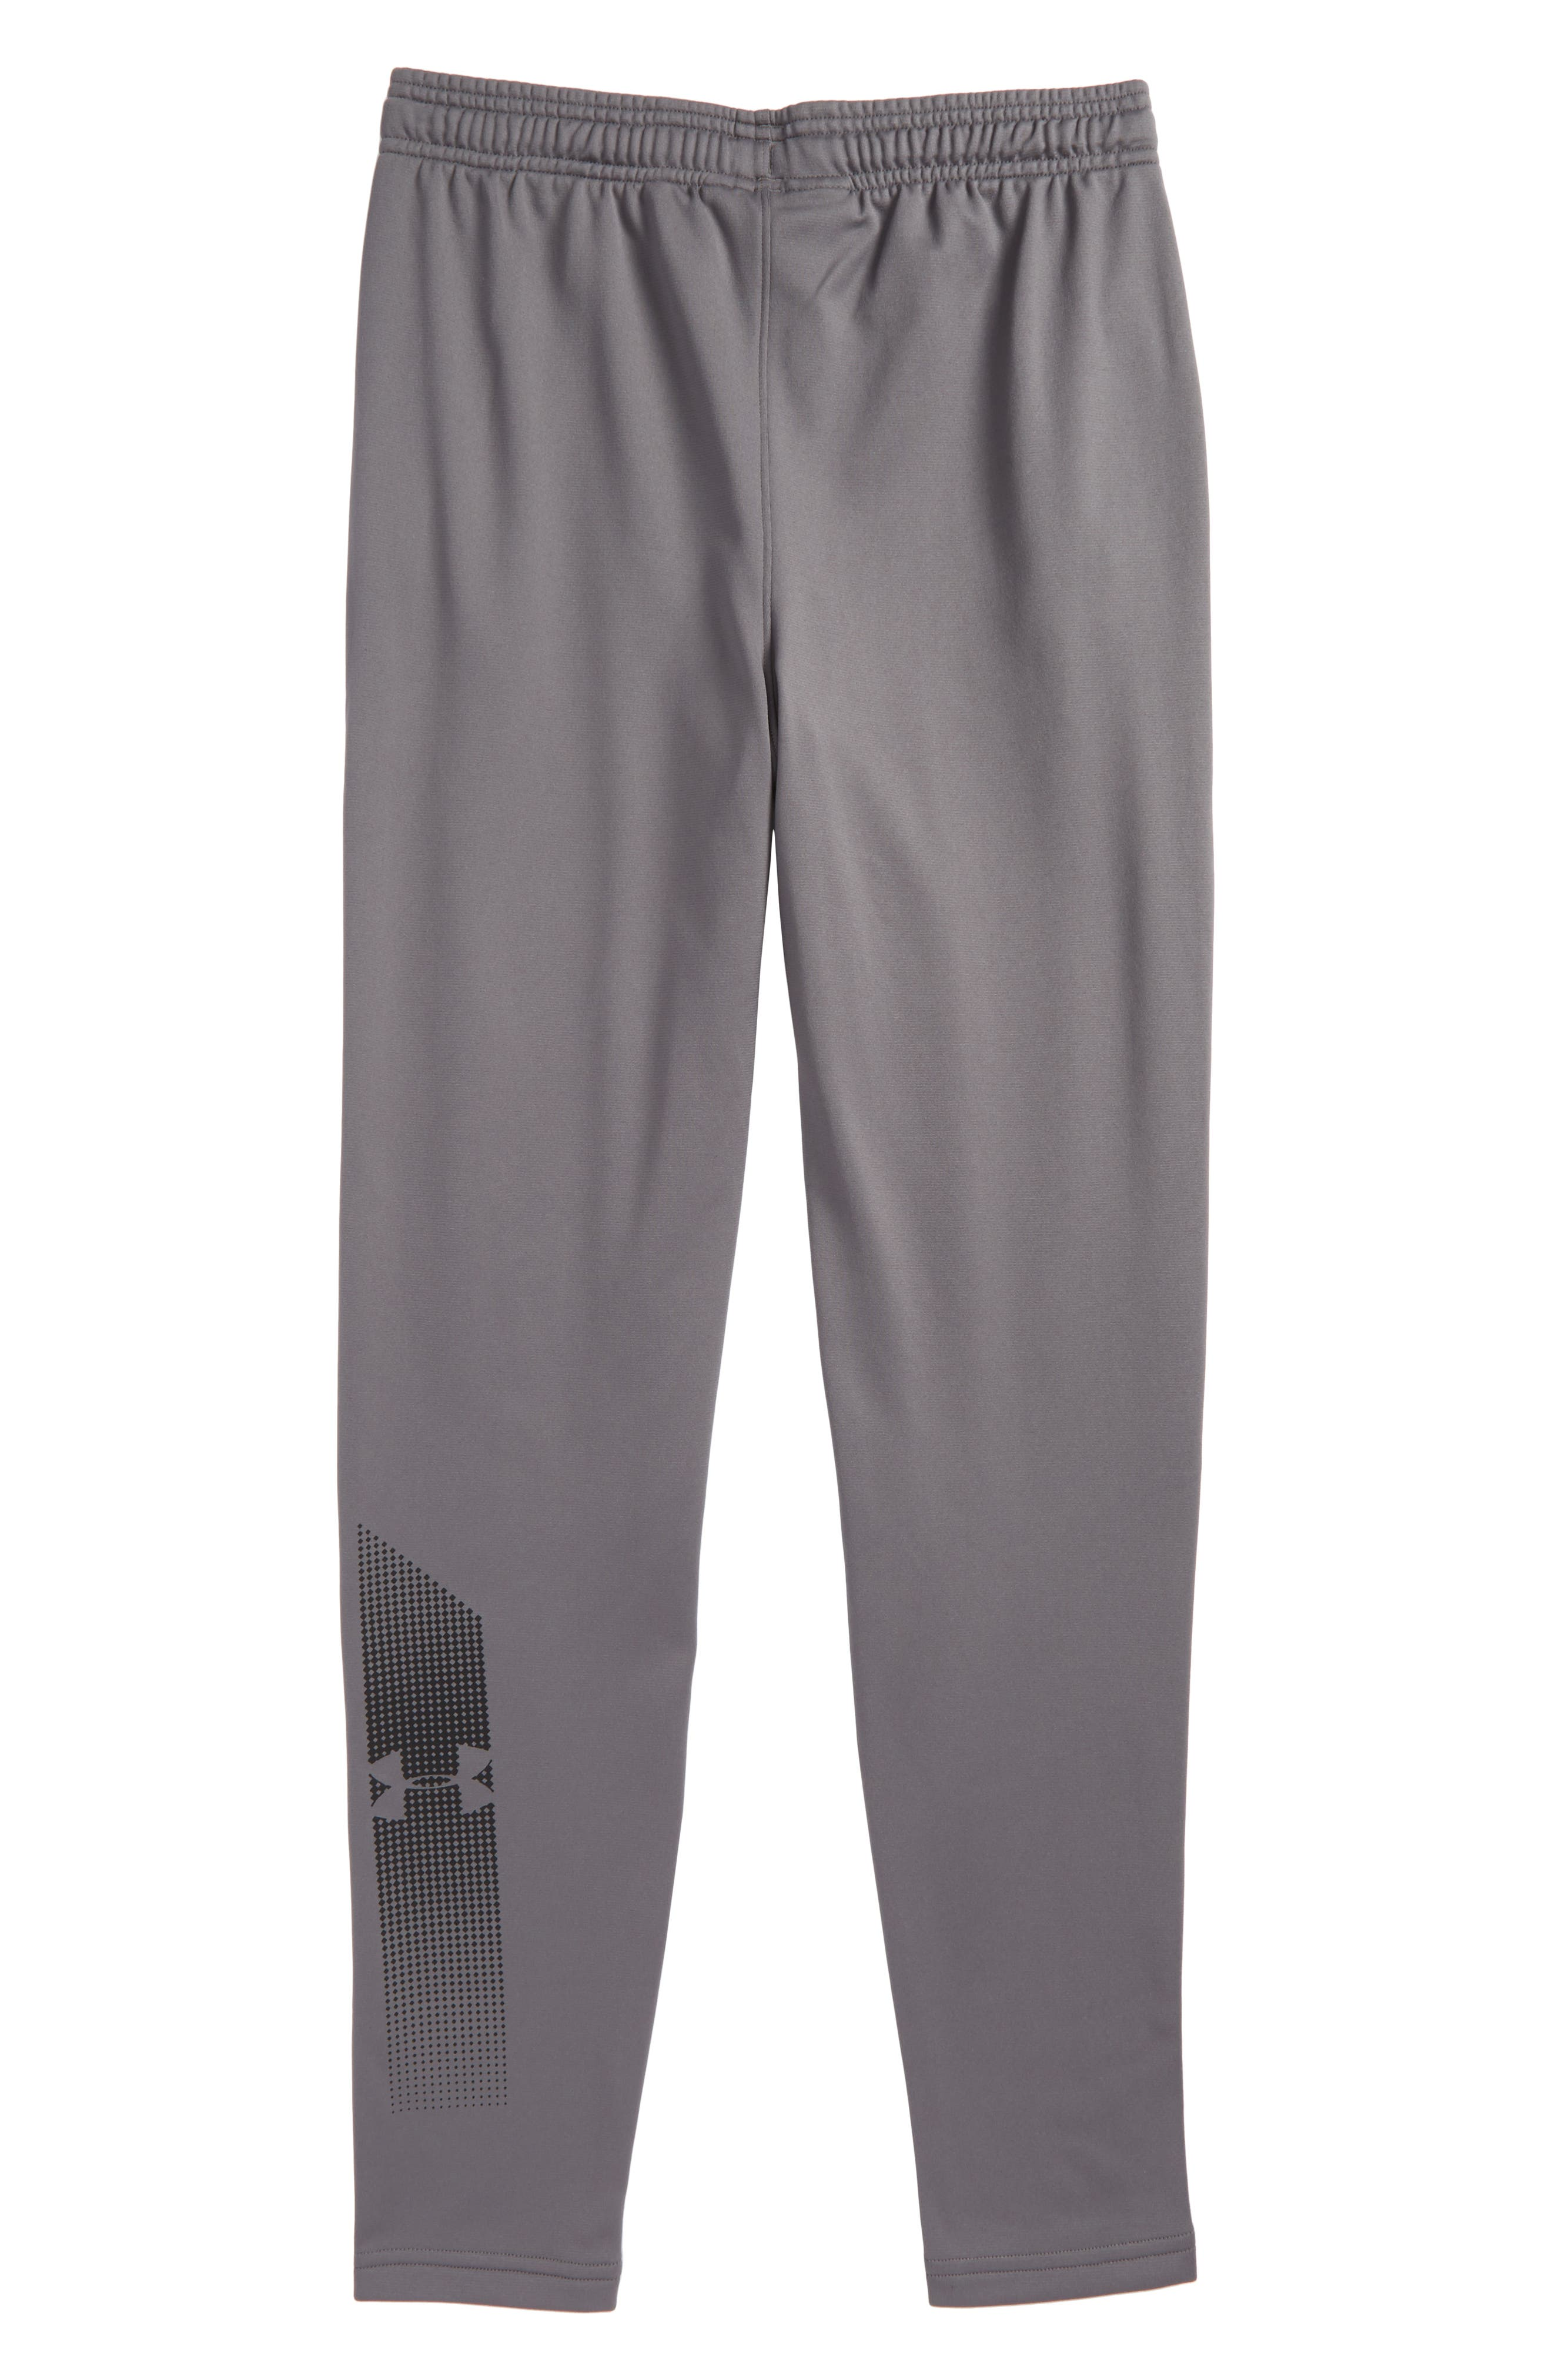 Brawler Tapered Sweatpants,                             Alternate thumbnail 2, color,                             Graphite/ Black